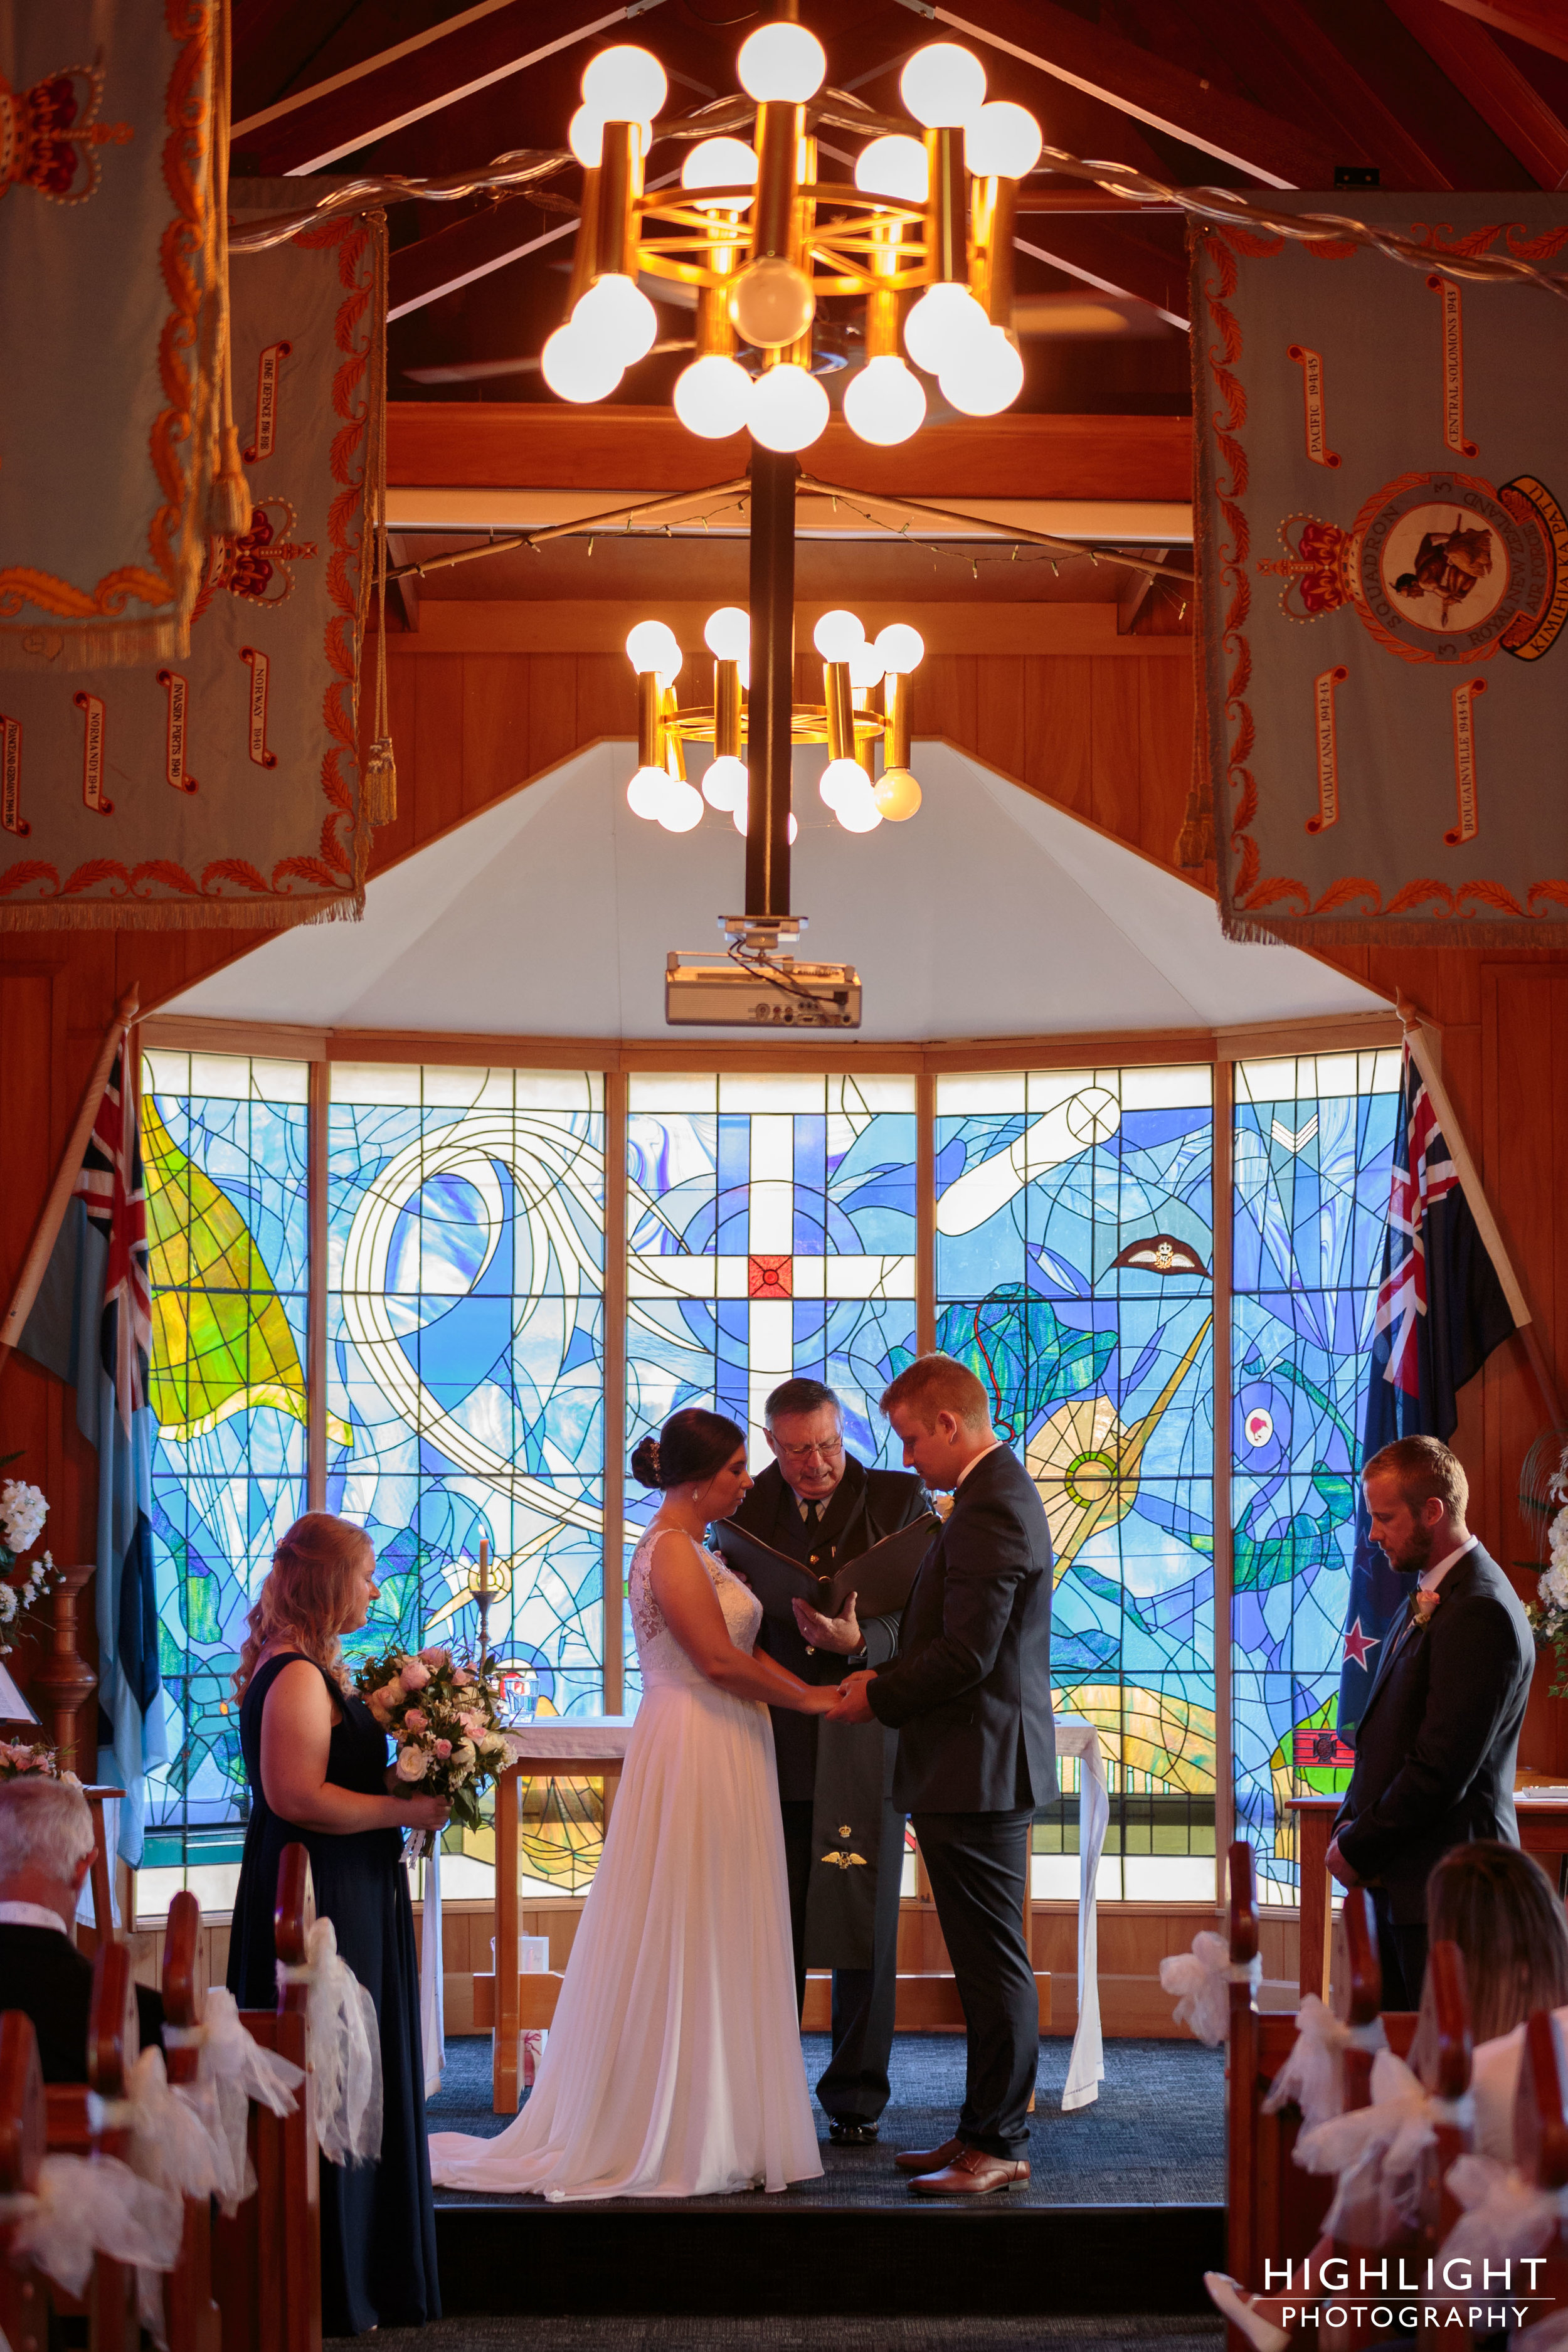 JM-2017-Highlight-wedding-photography-palmerston-north-new-zealand-66.jpg